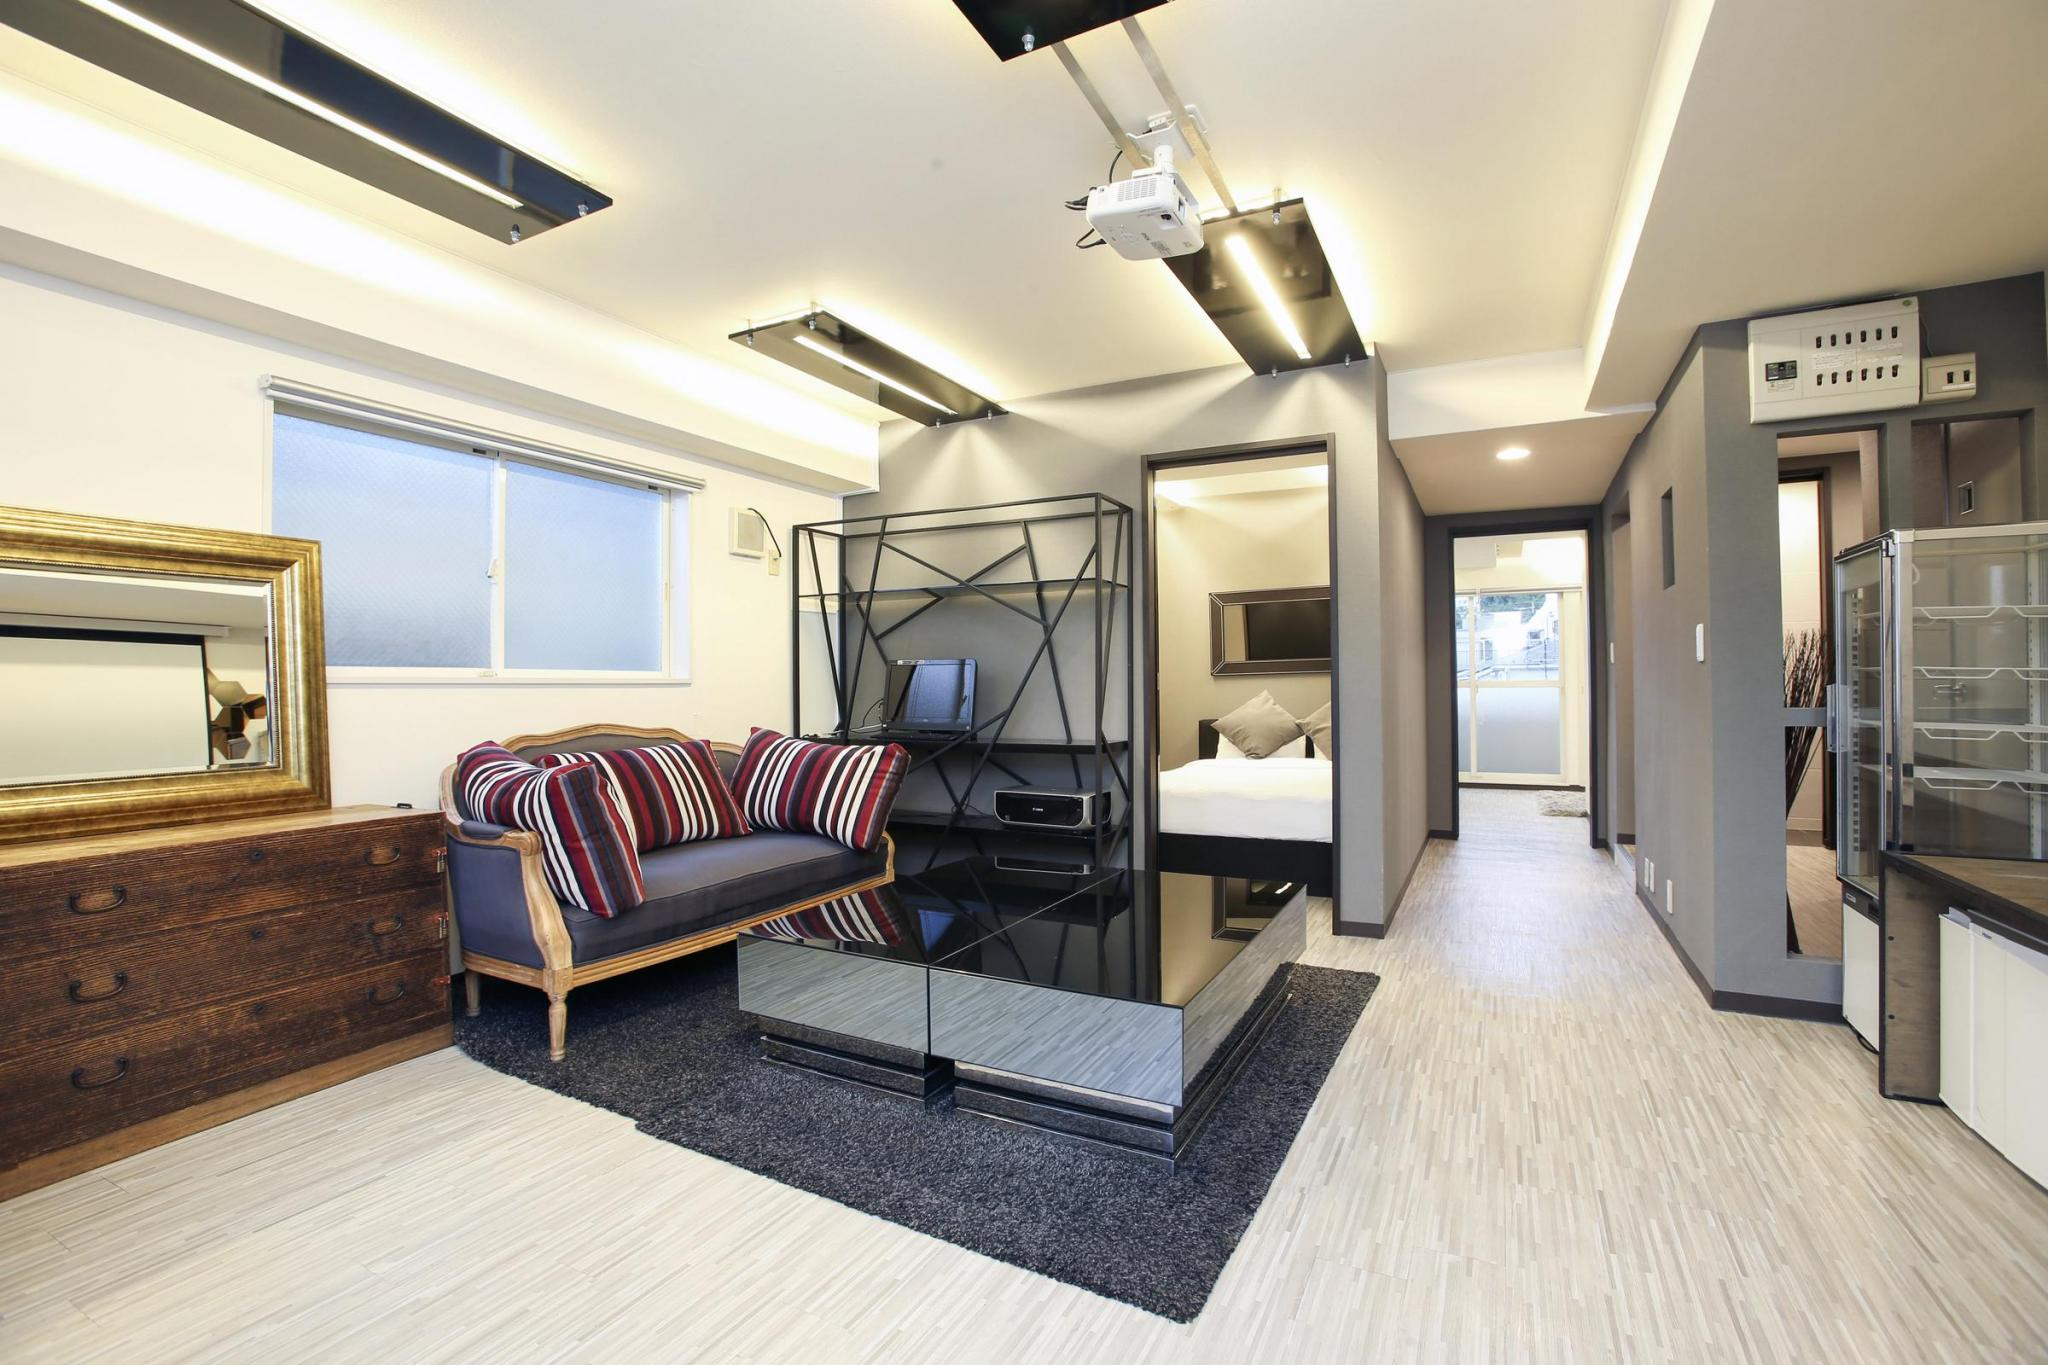 2LDK Apartment - Akasaka - Minato-ku - Tokyo - Japan - For ...